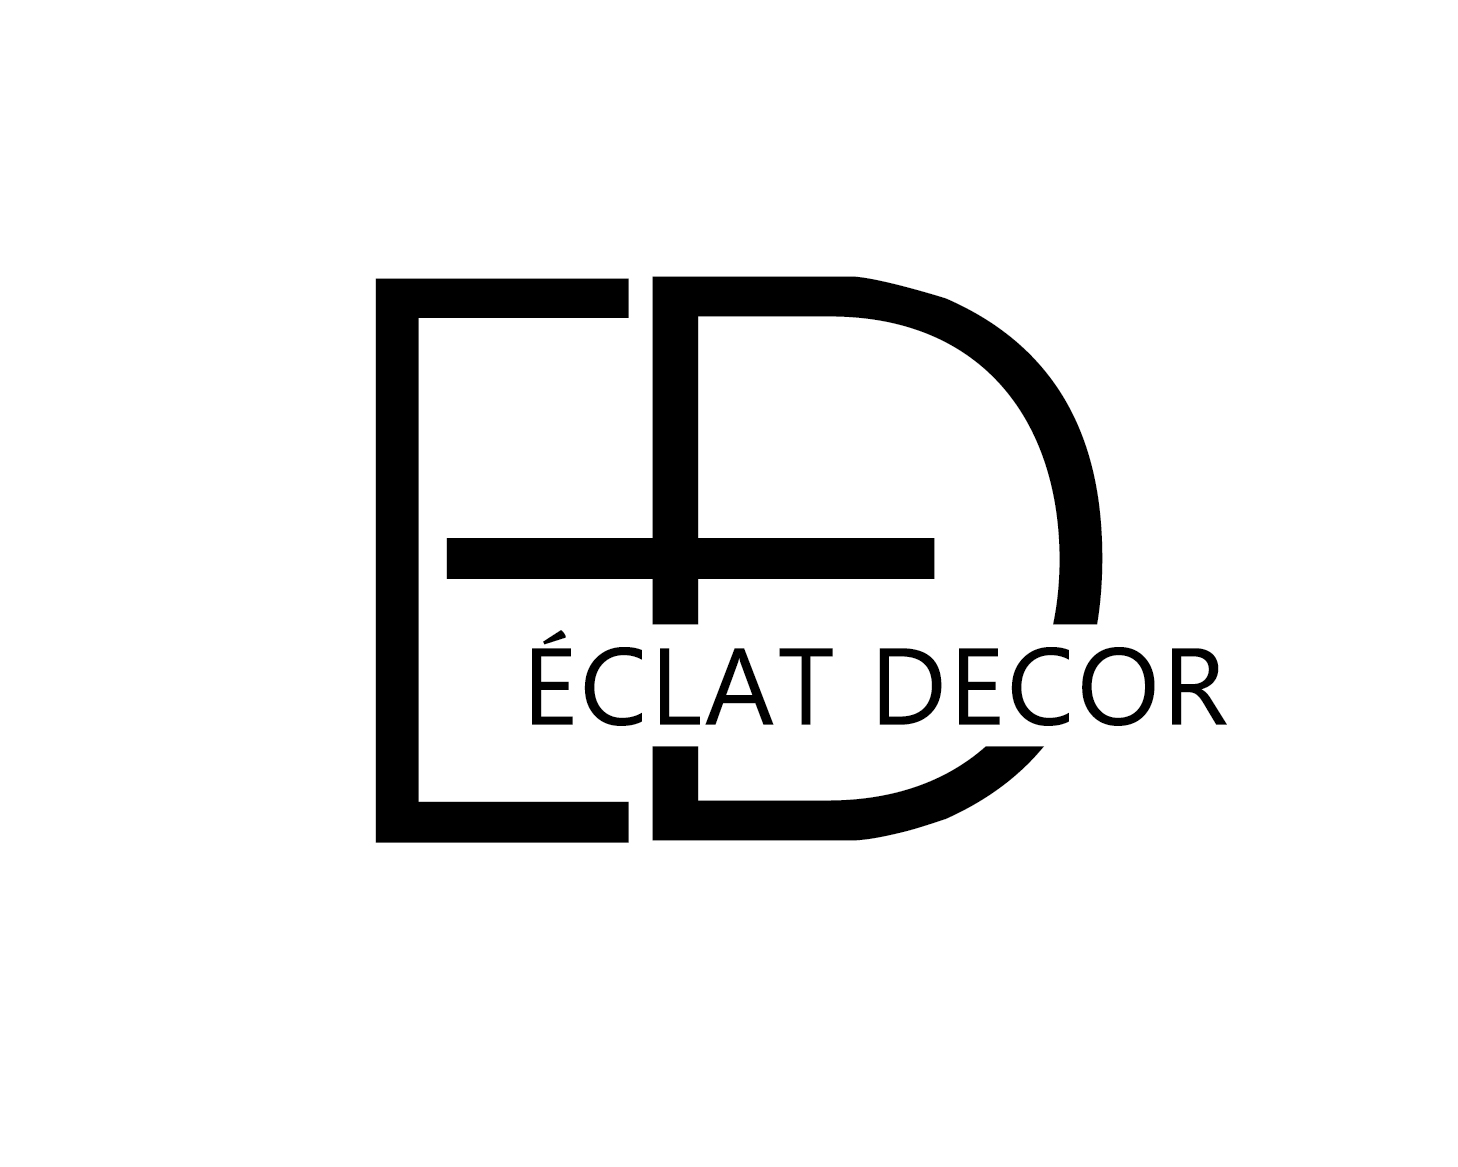 Logo Design by VENTSISLAV KOVACHEV - Entry No. 1 in the Logo Design Contest Imaginative Logo Design for Éclat Decor.